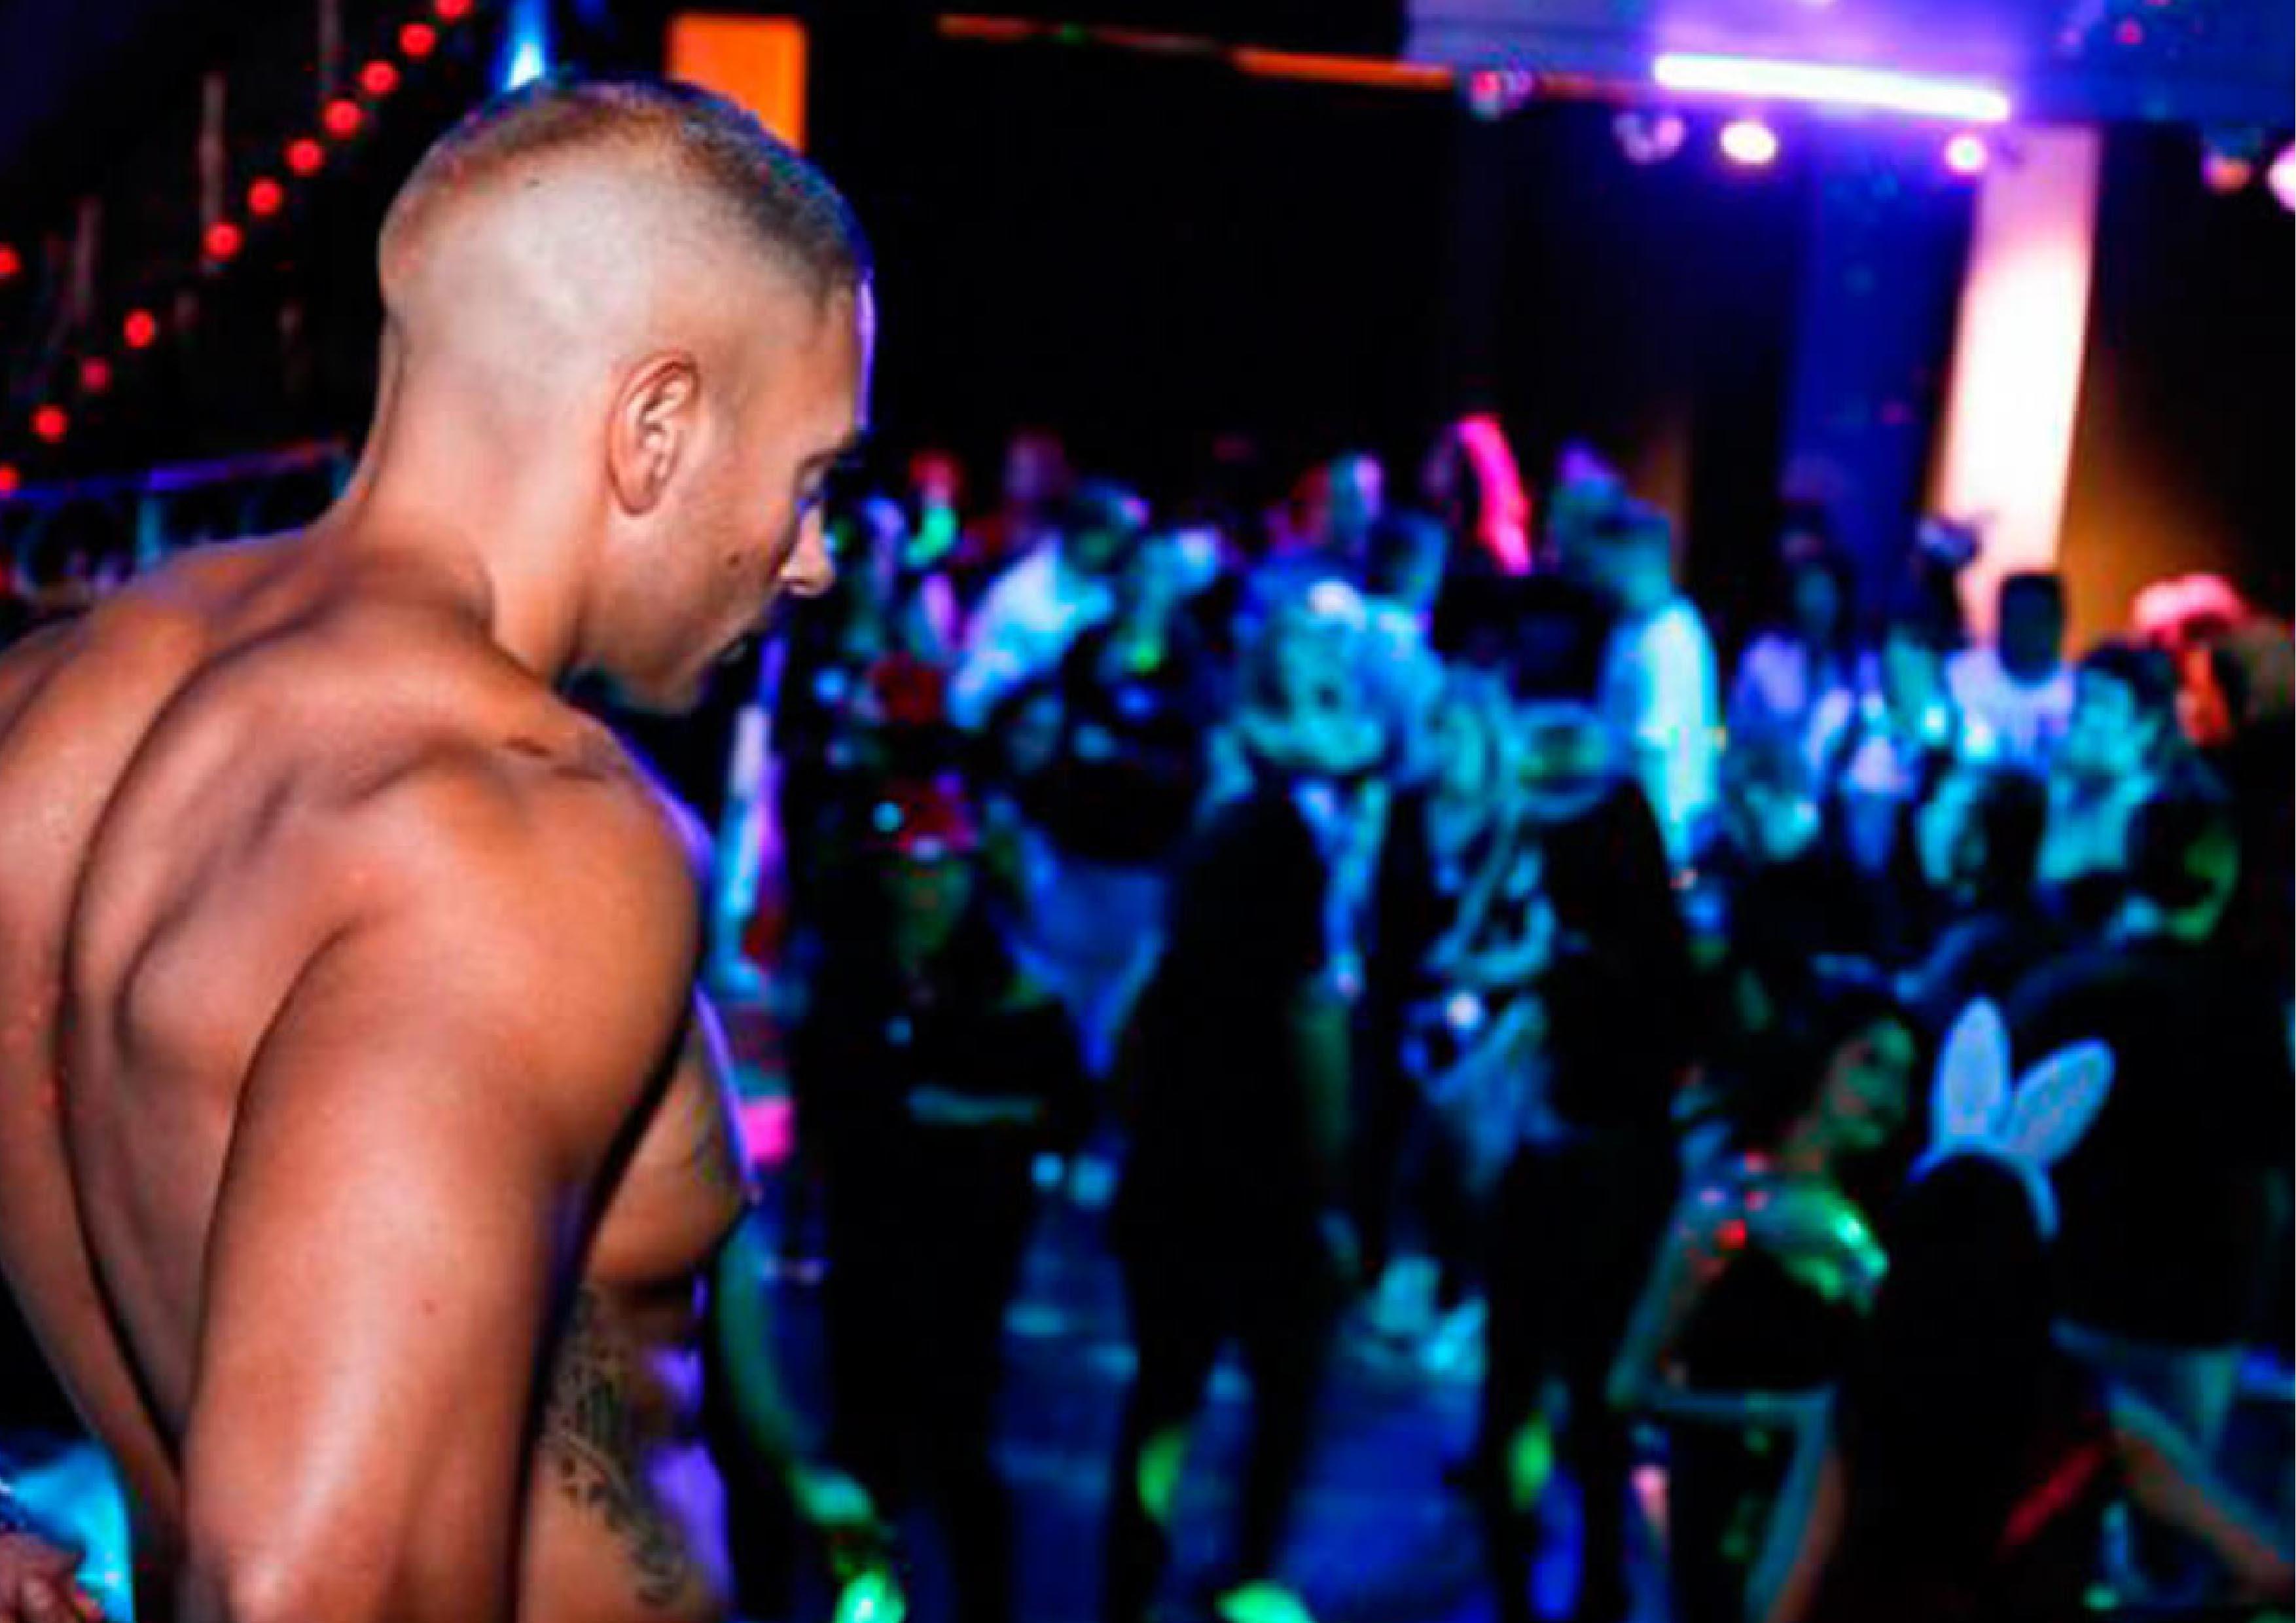 despedidas farley despedida de soltero en murcia discoteca troya animador